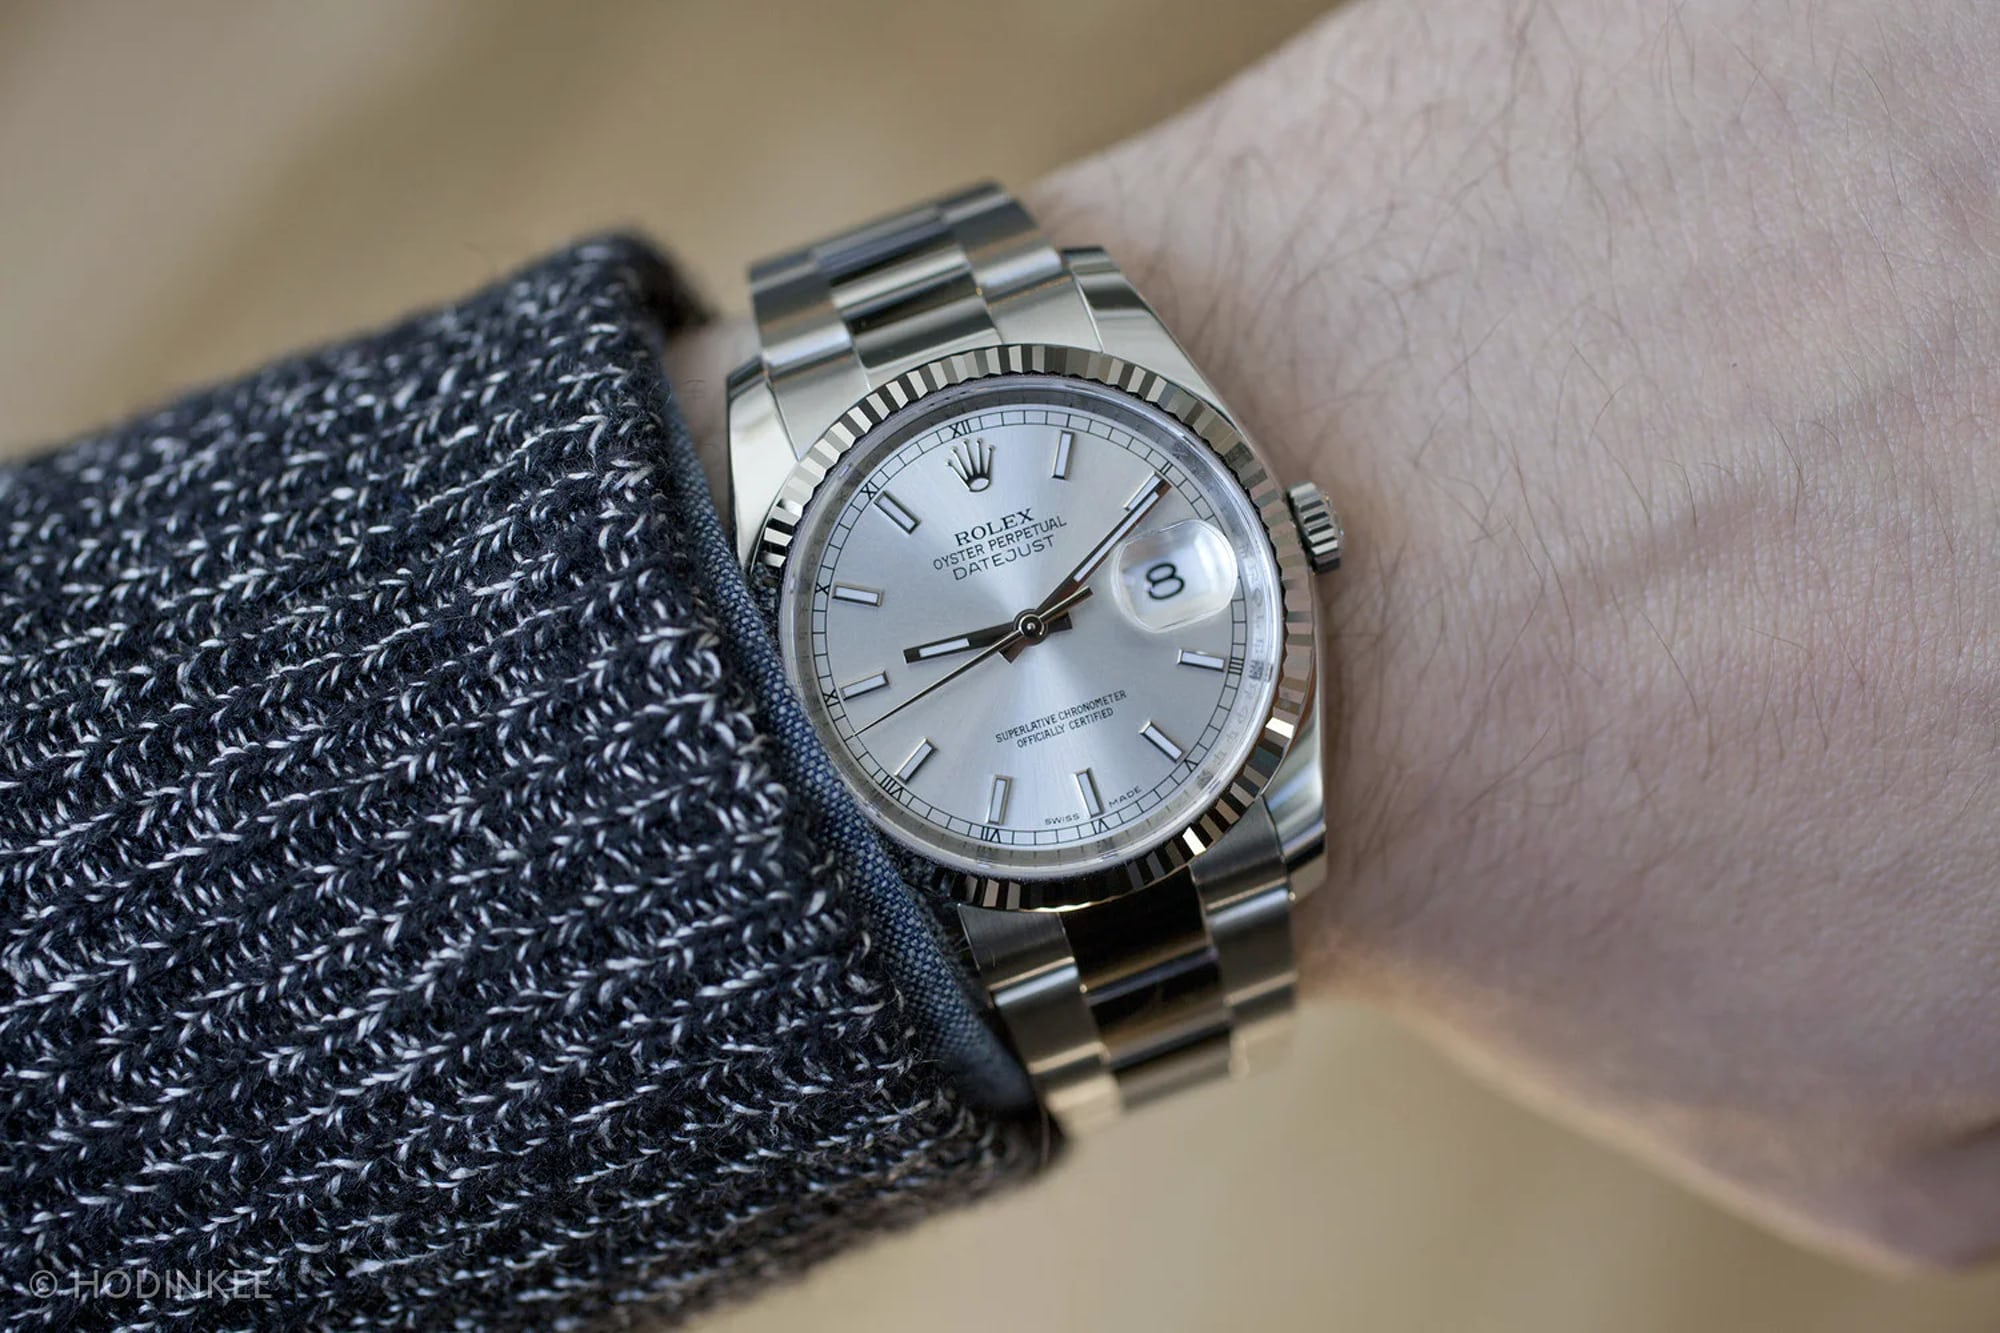 Sunday Rewind: A Closer Look At The Rolex Datejust